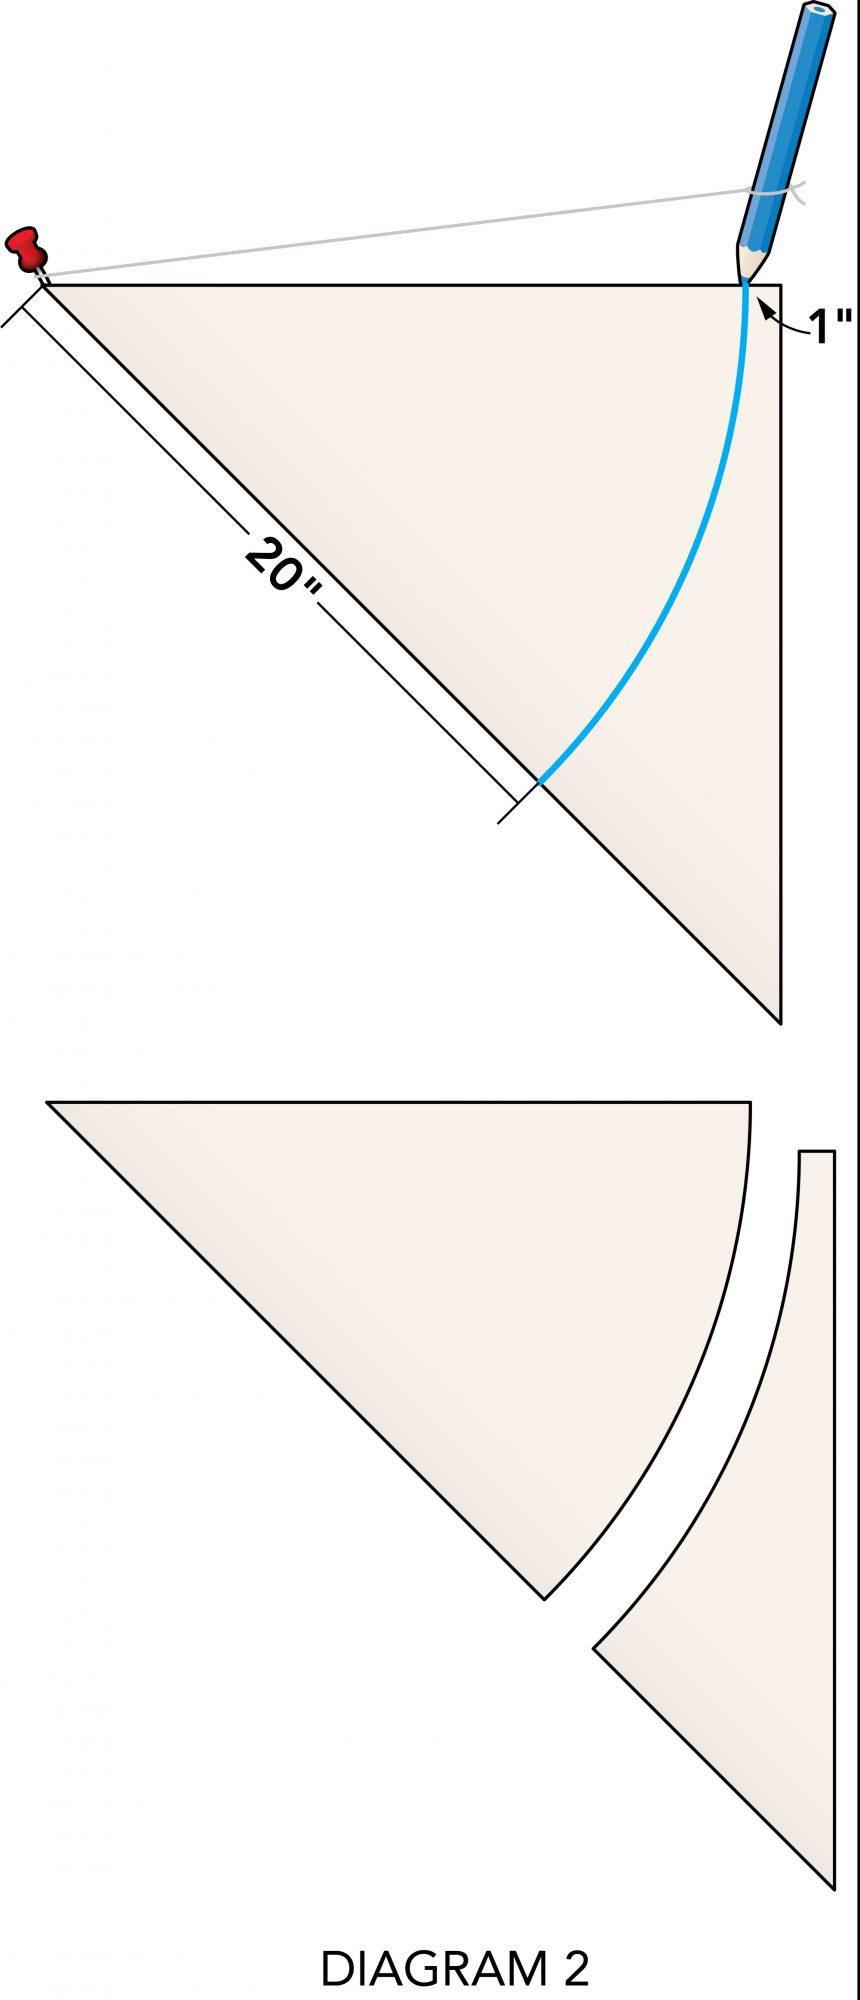 Shiny Baubles diagram 2